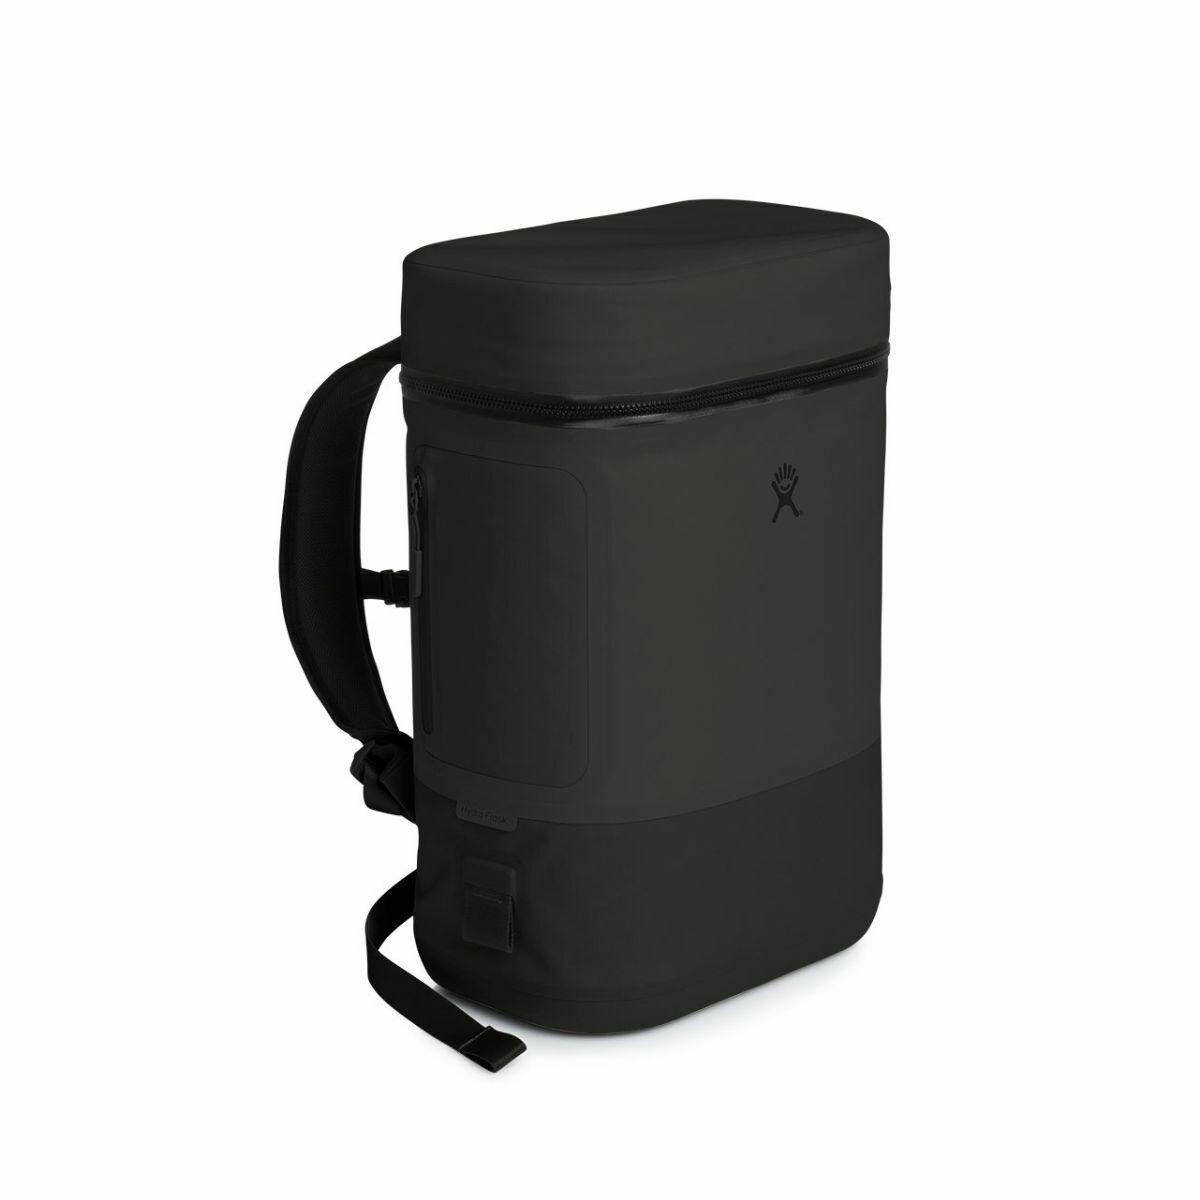 Hydro Flask 22L Soft Cooler Pack- Black